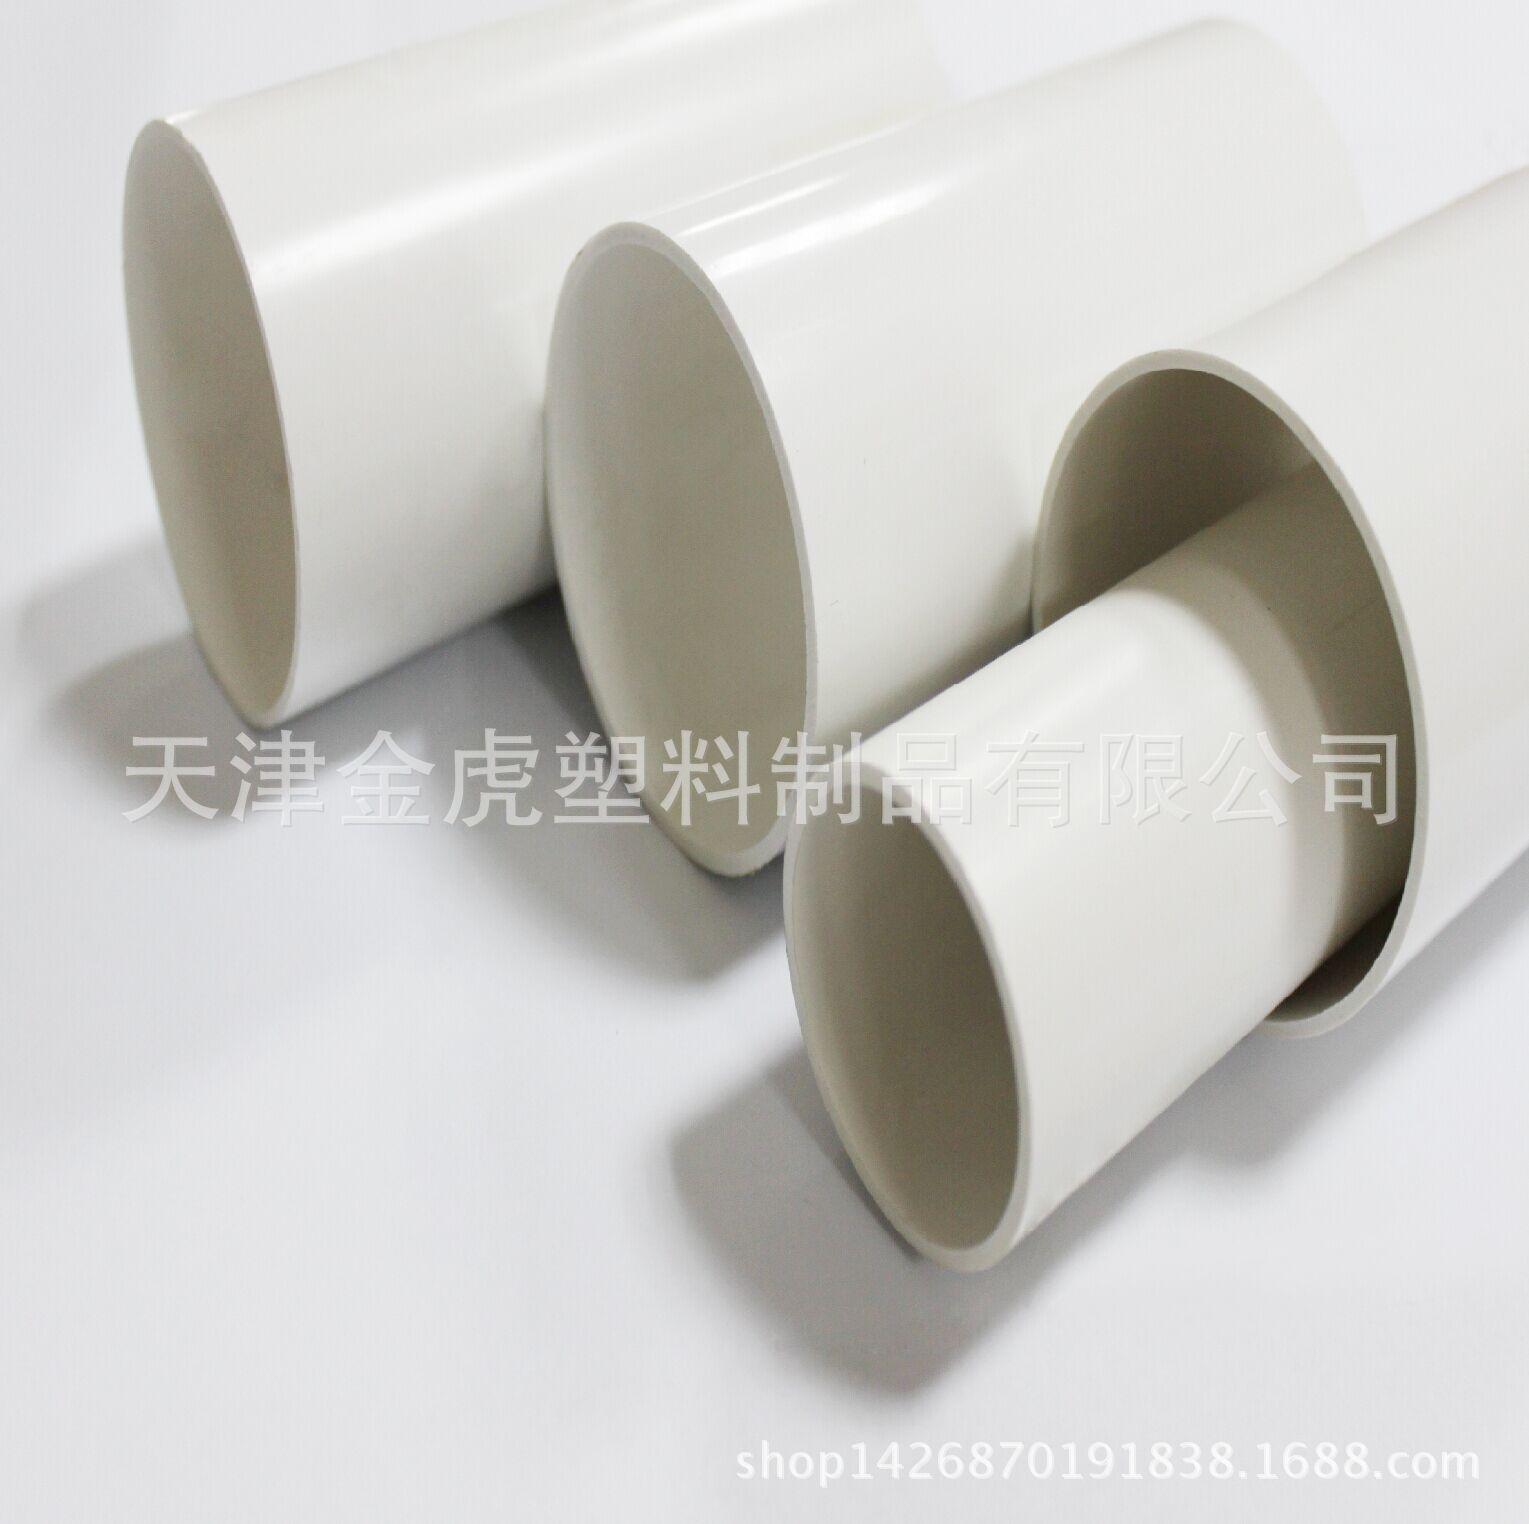 pvc排水管 110管 pvc实壁排水管材检测 性能改进 pvc管配方